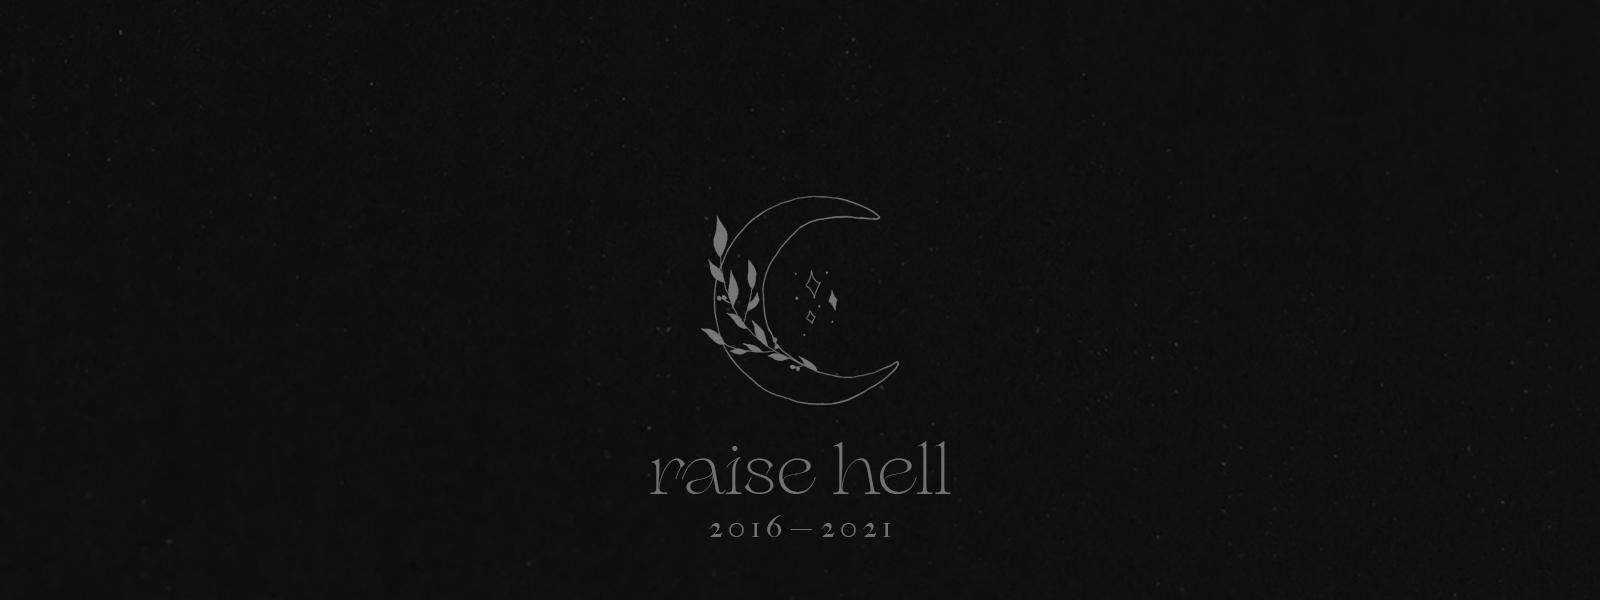 ≡ RAISE HELL.